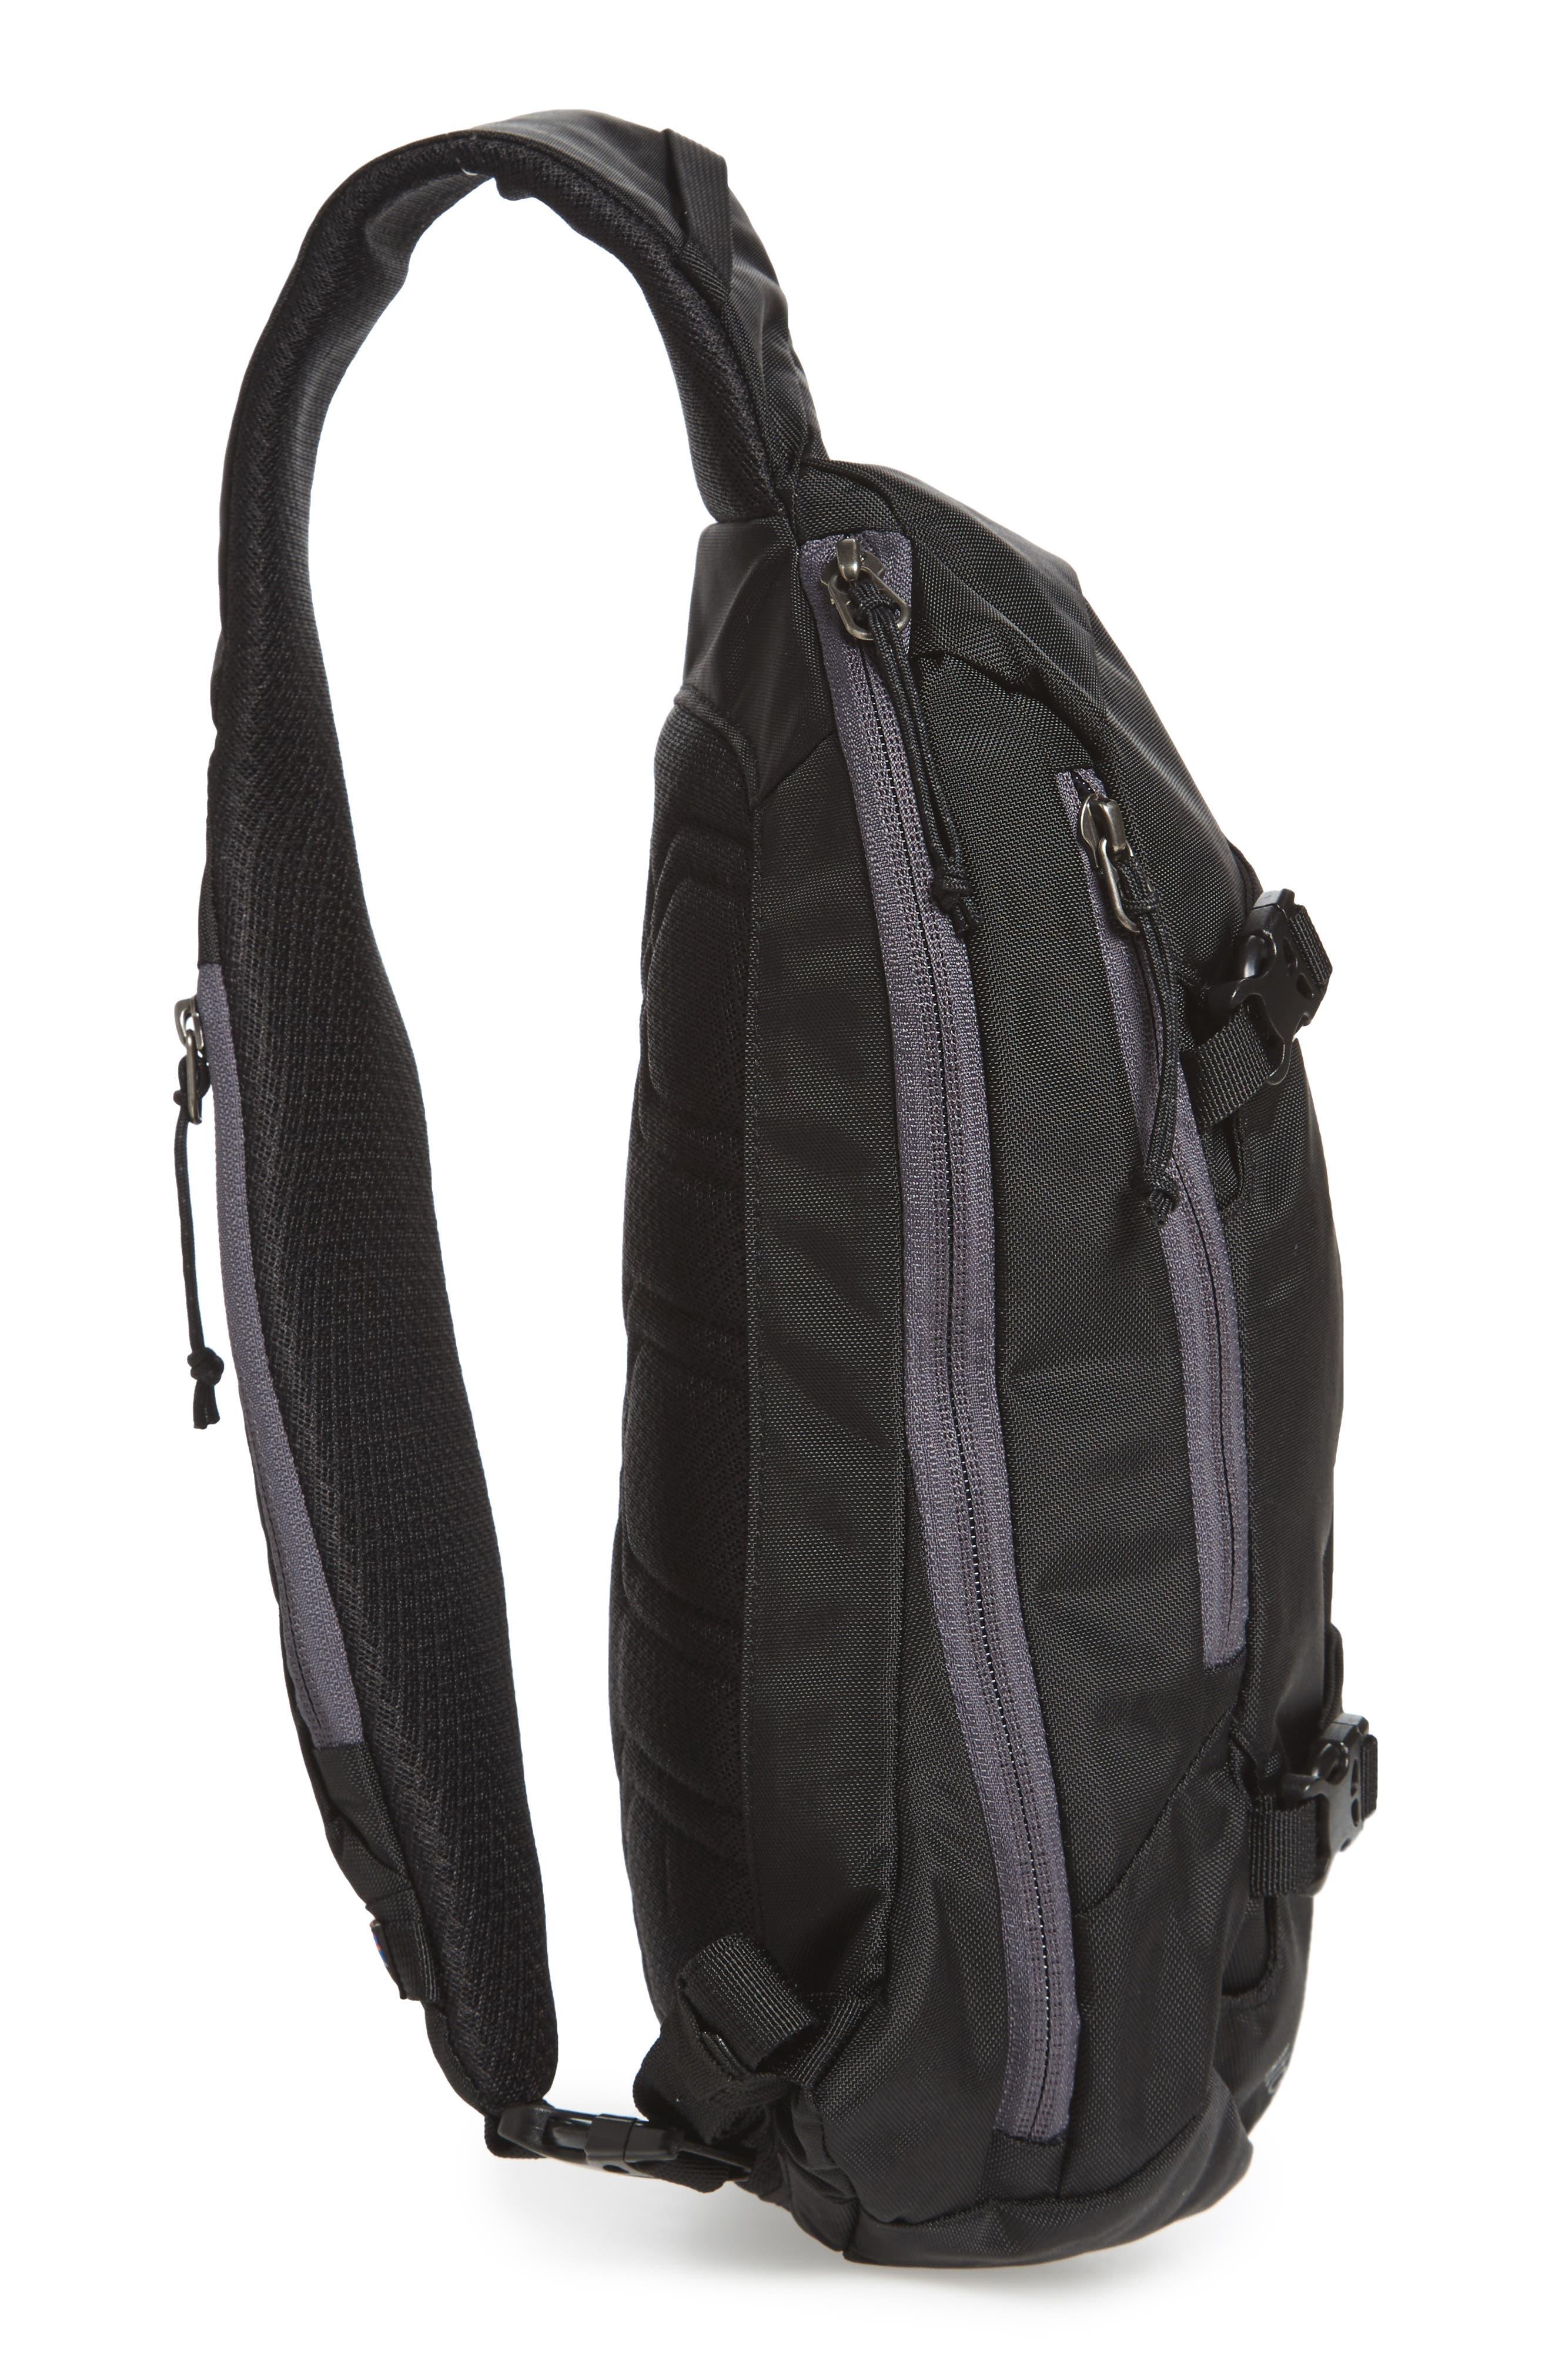 PATAGONIA, Atom 8L Sling Backpack, Alternate thumbnail 6, color, BLACK